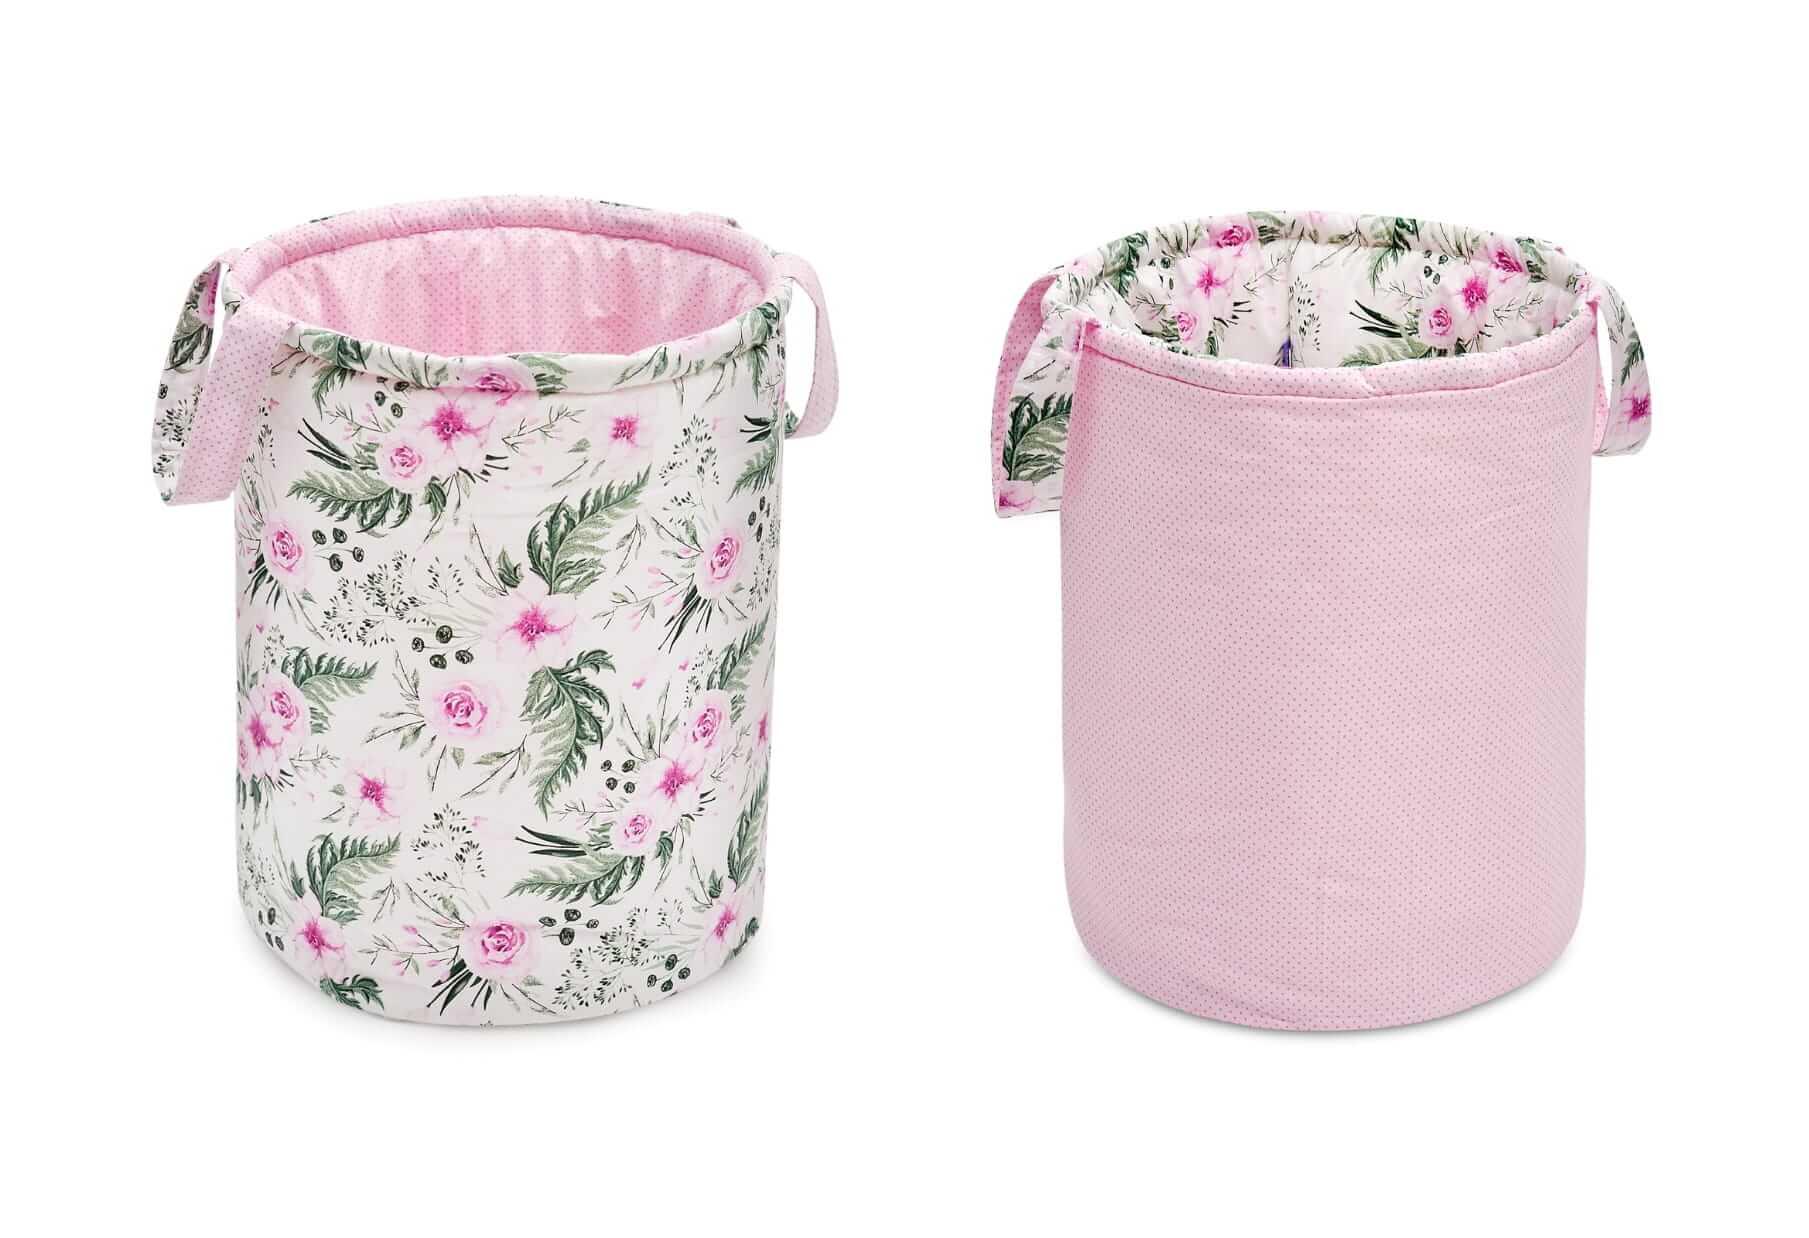 Kosz na zabawki, dwustronny, in garden pink